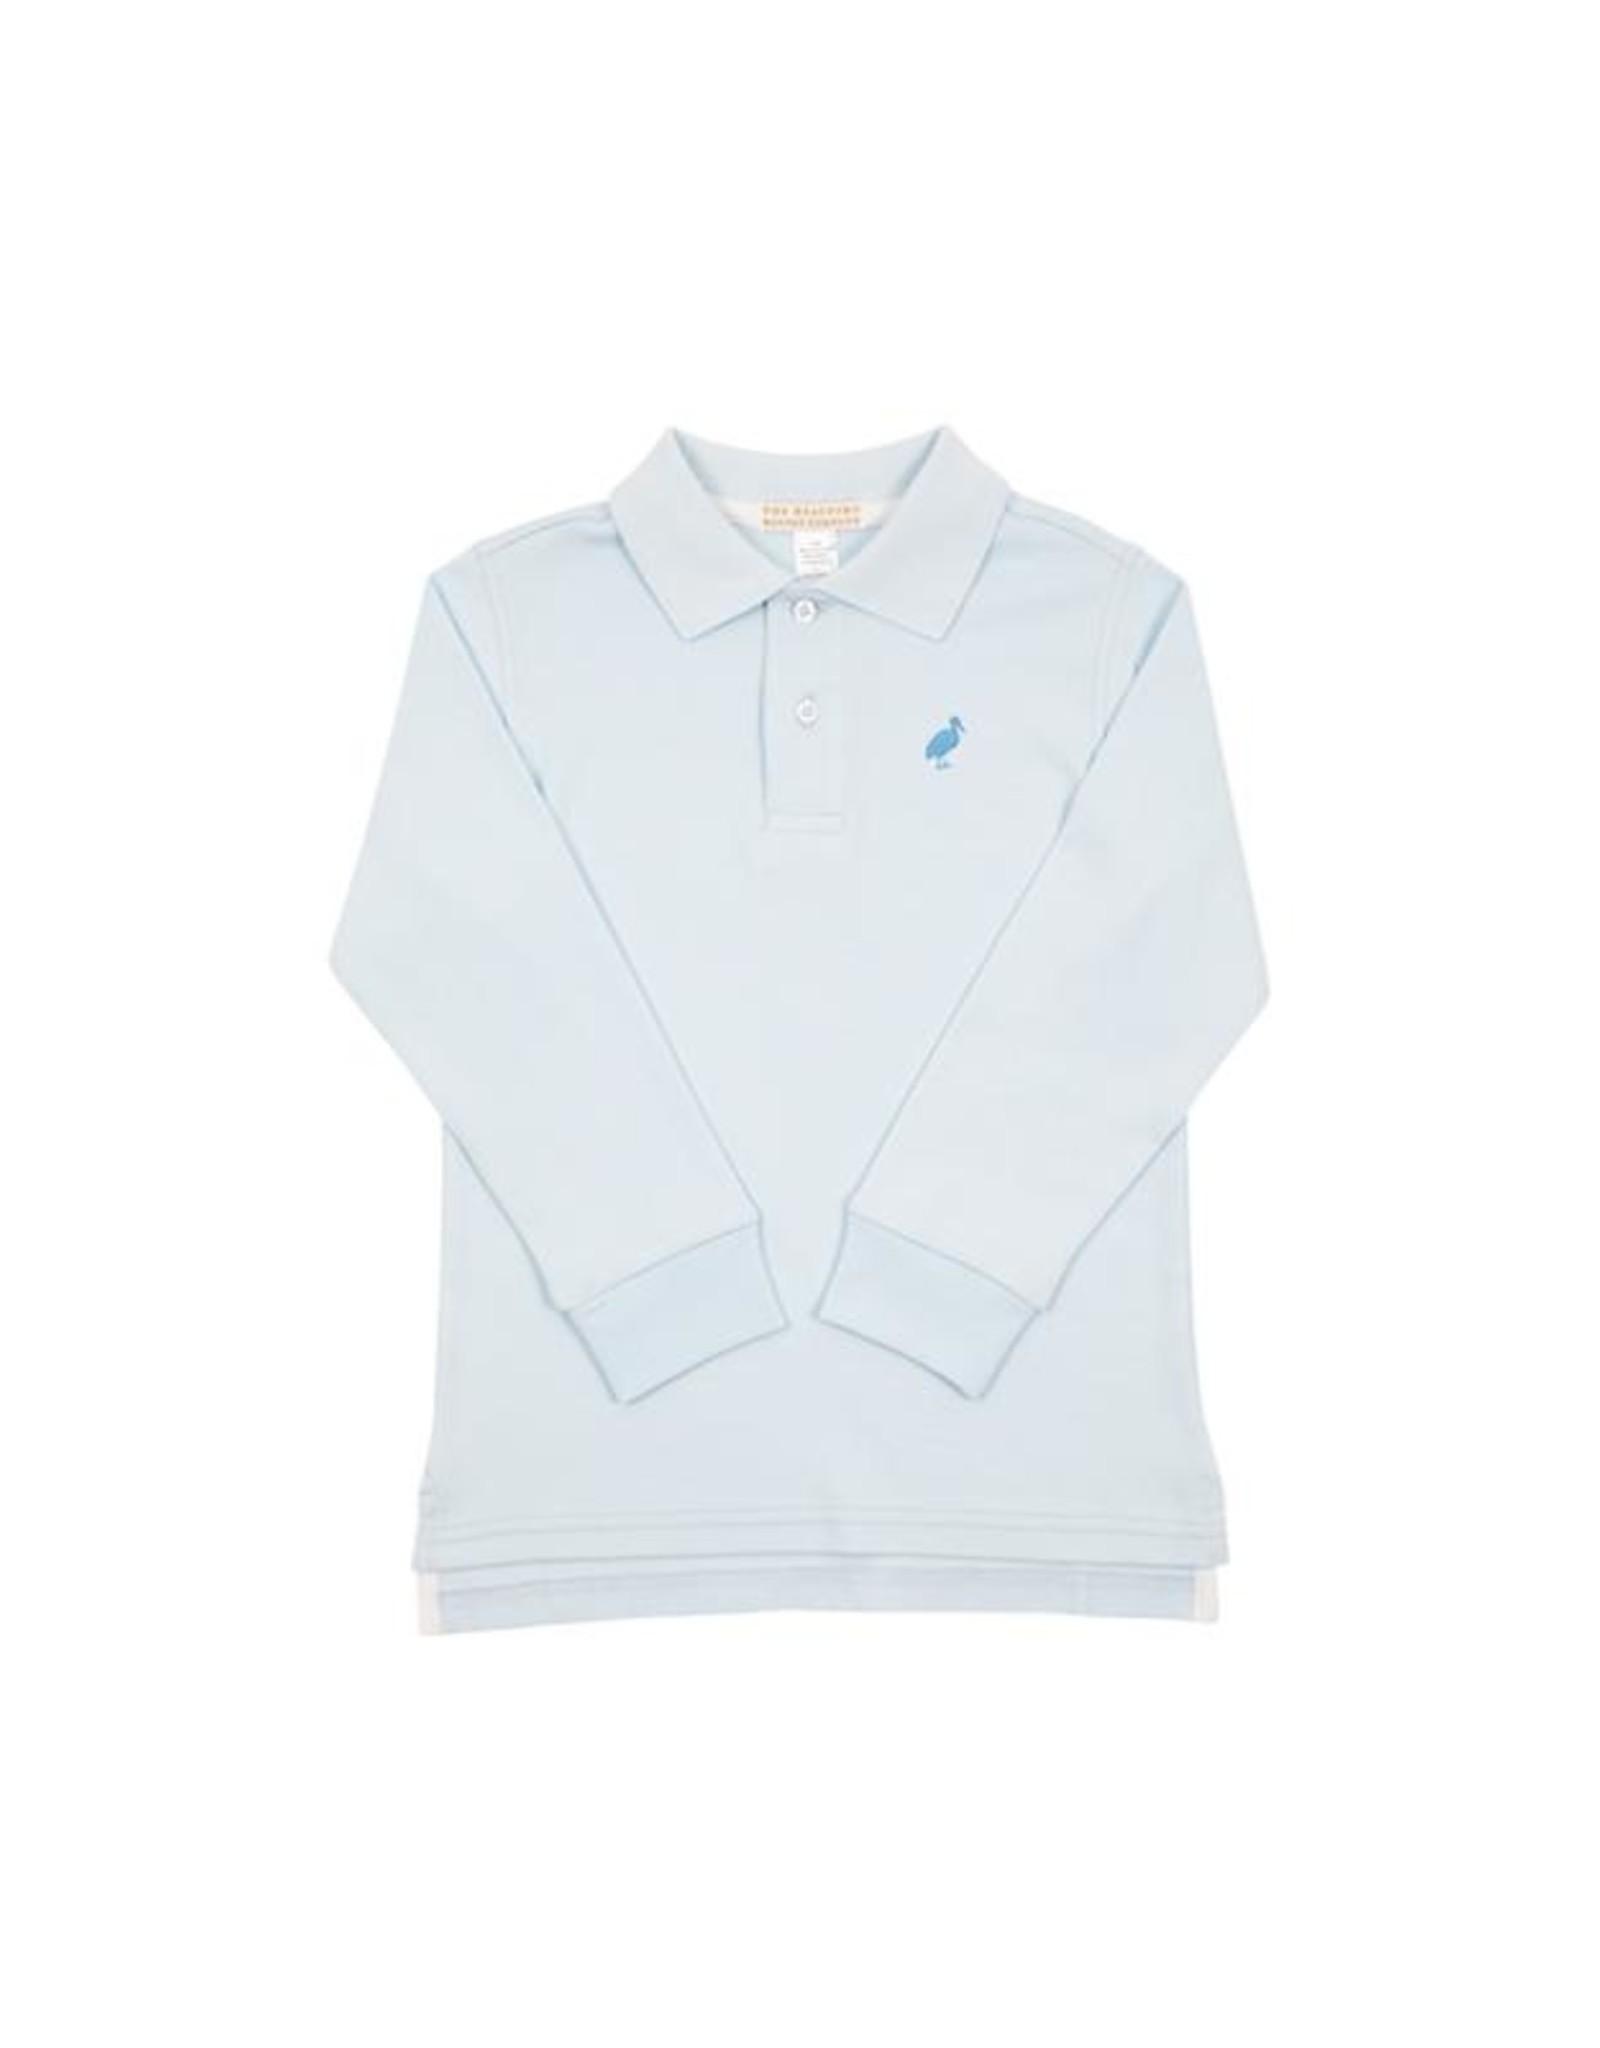 The Beaufort Bonnet Company Prim & Proper LS Pima Polo, Buckhead Blue